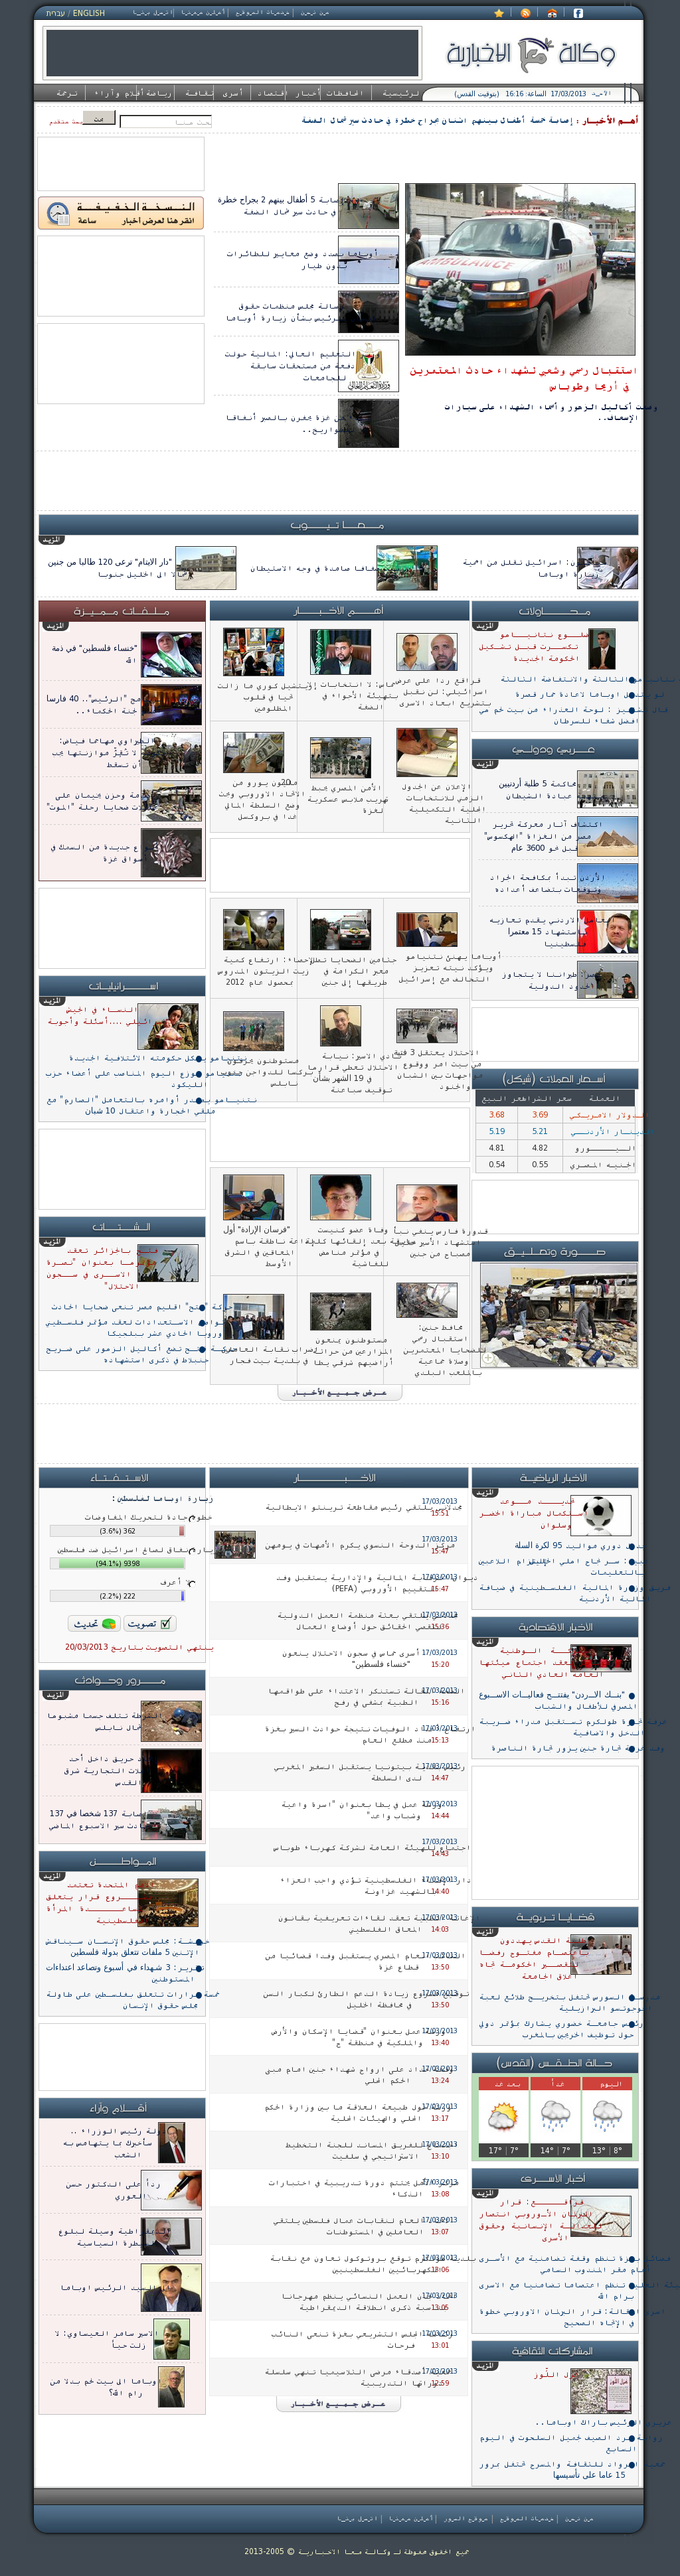 Ma'an News at Sunday March 17, 2013, 2:15 p.m. UTC